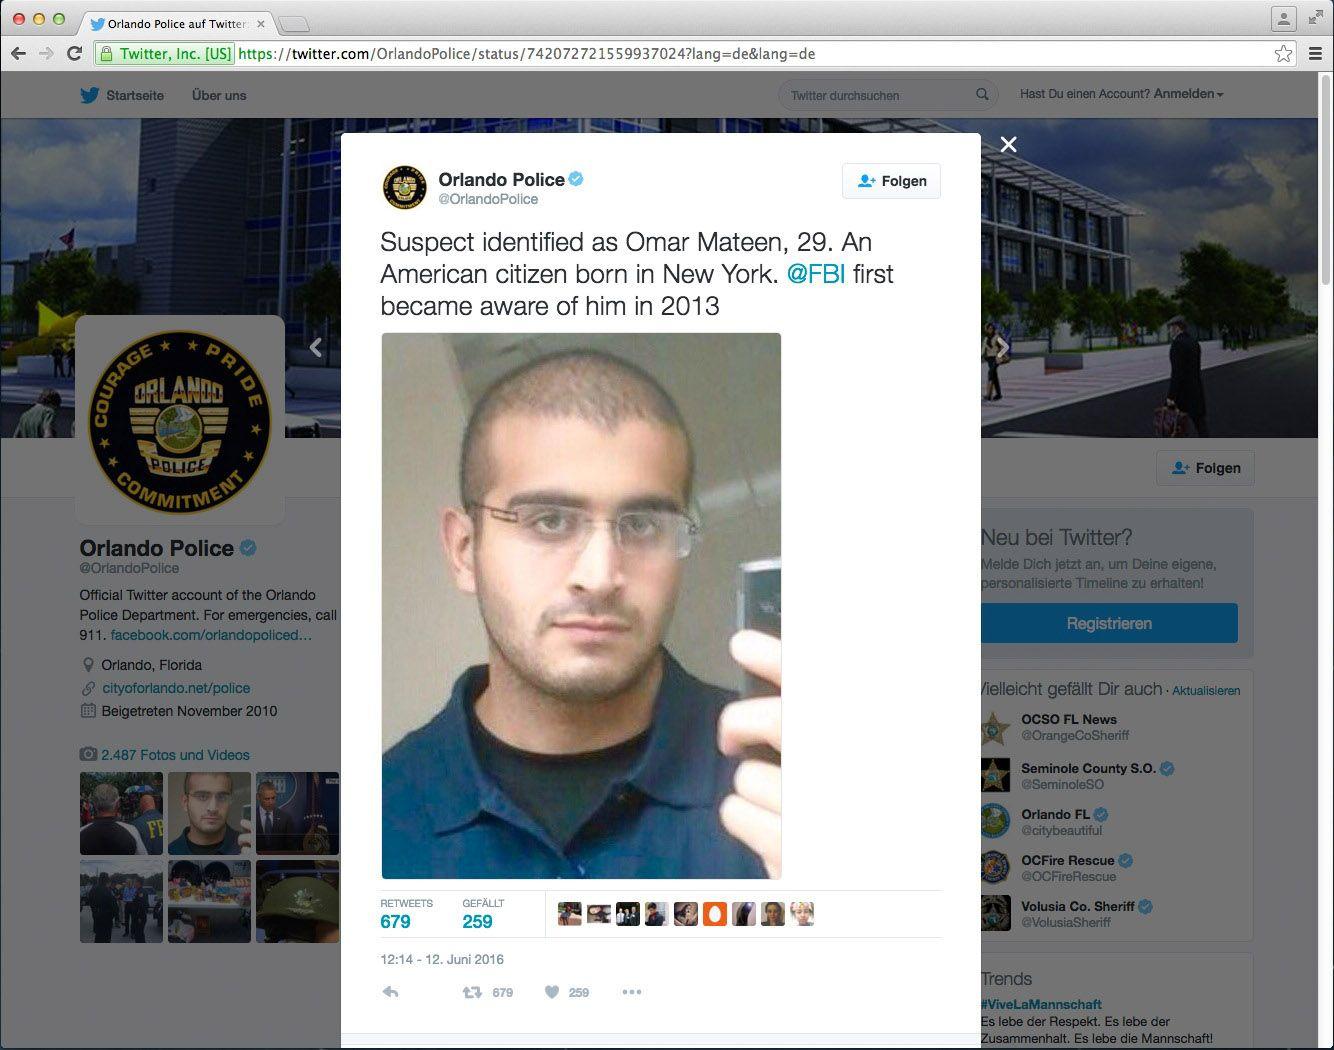 EINMALIGE VERWENDUNG SCREENSHOT / Orlando Police / Omar Mateen